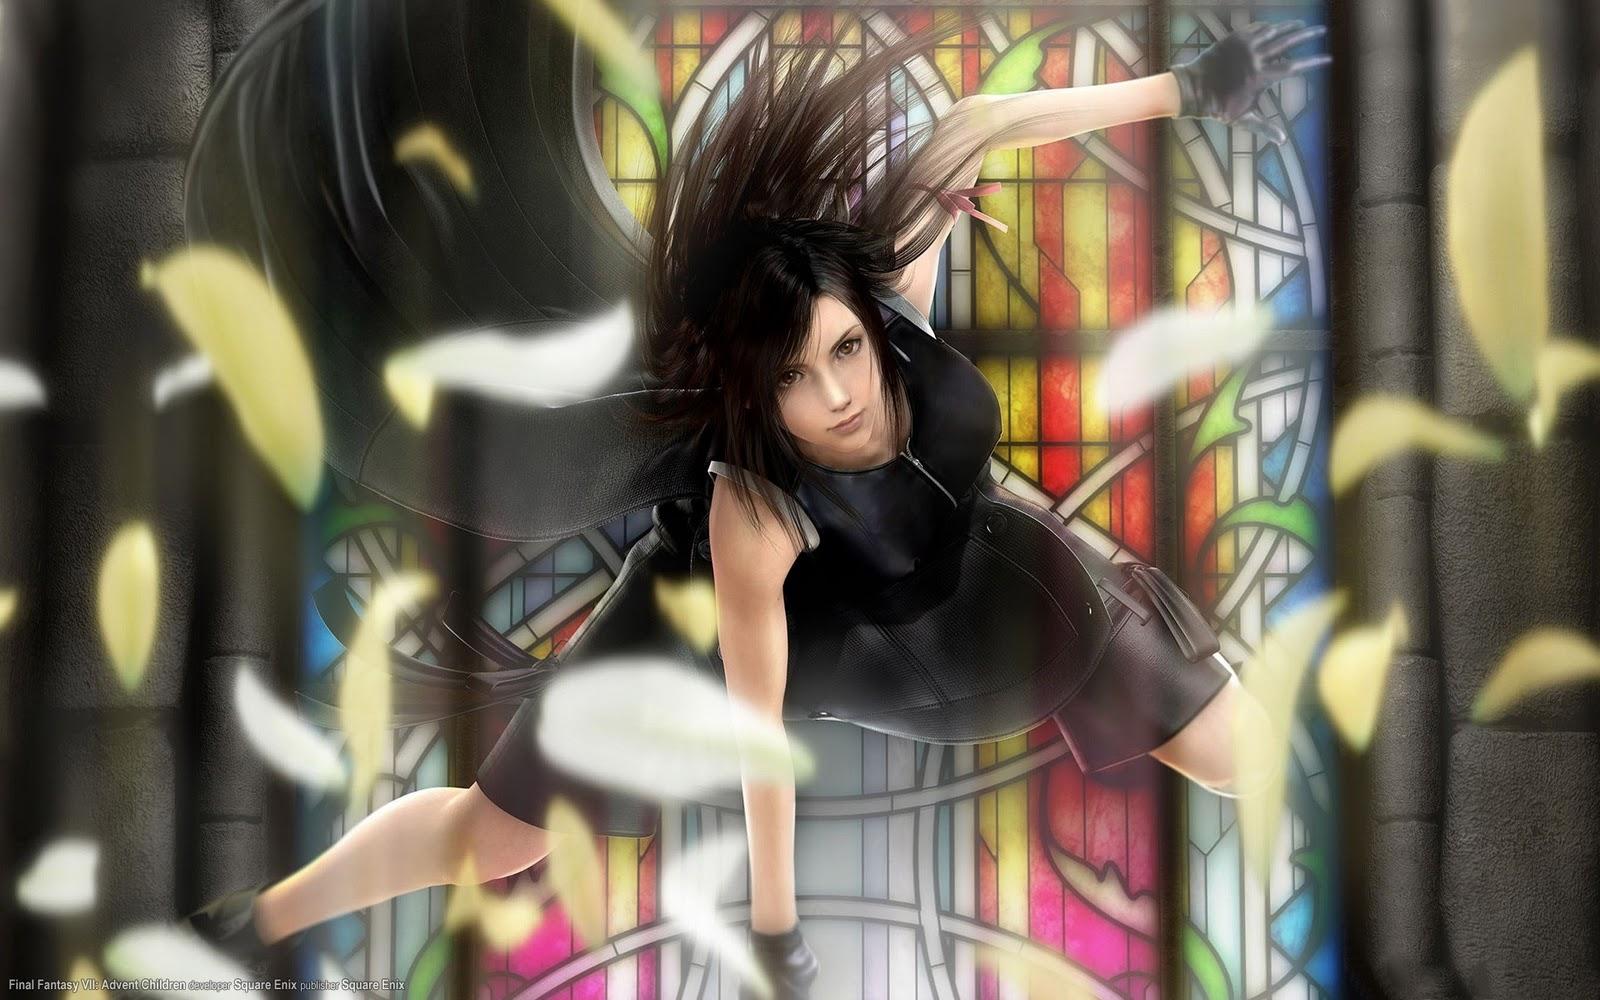 Japan Anime - Final Fantasy